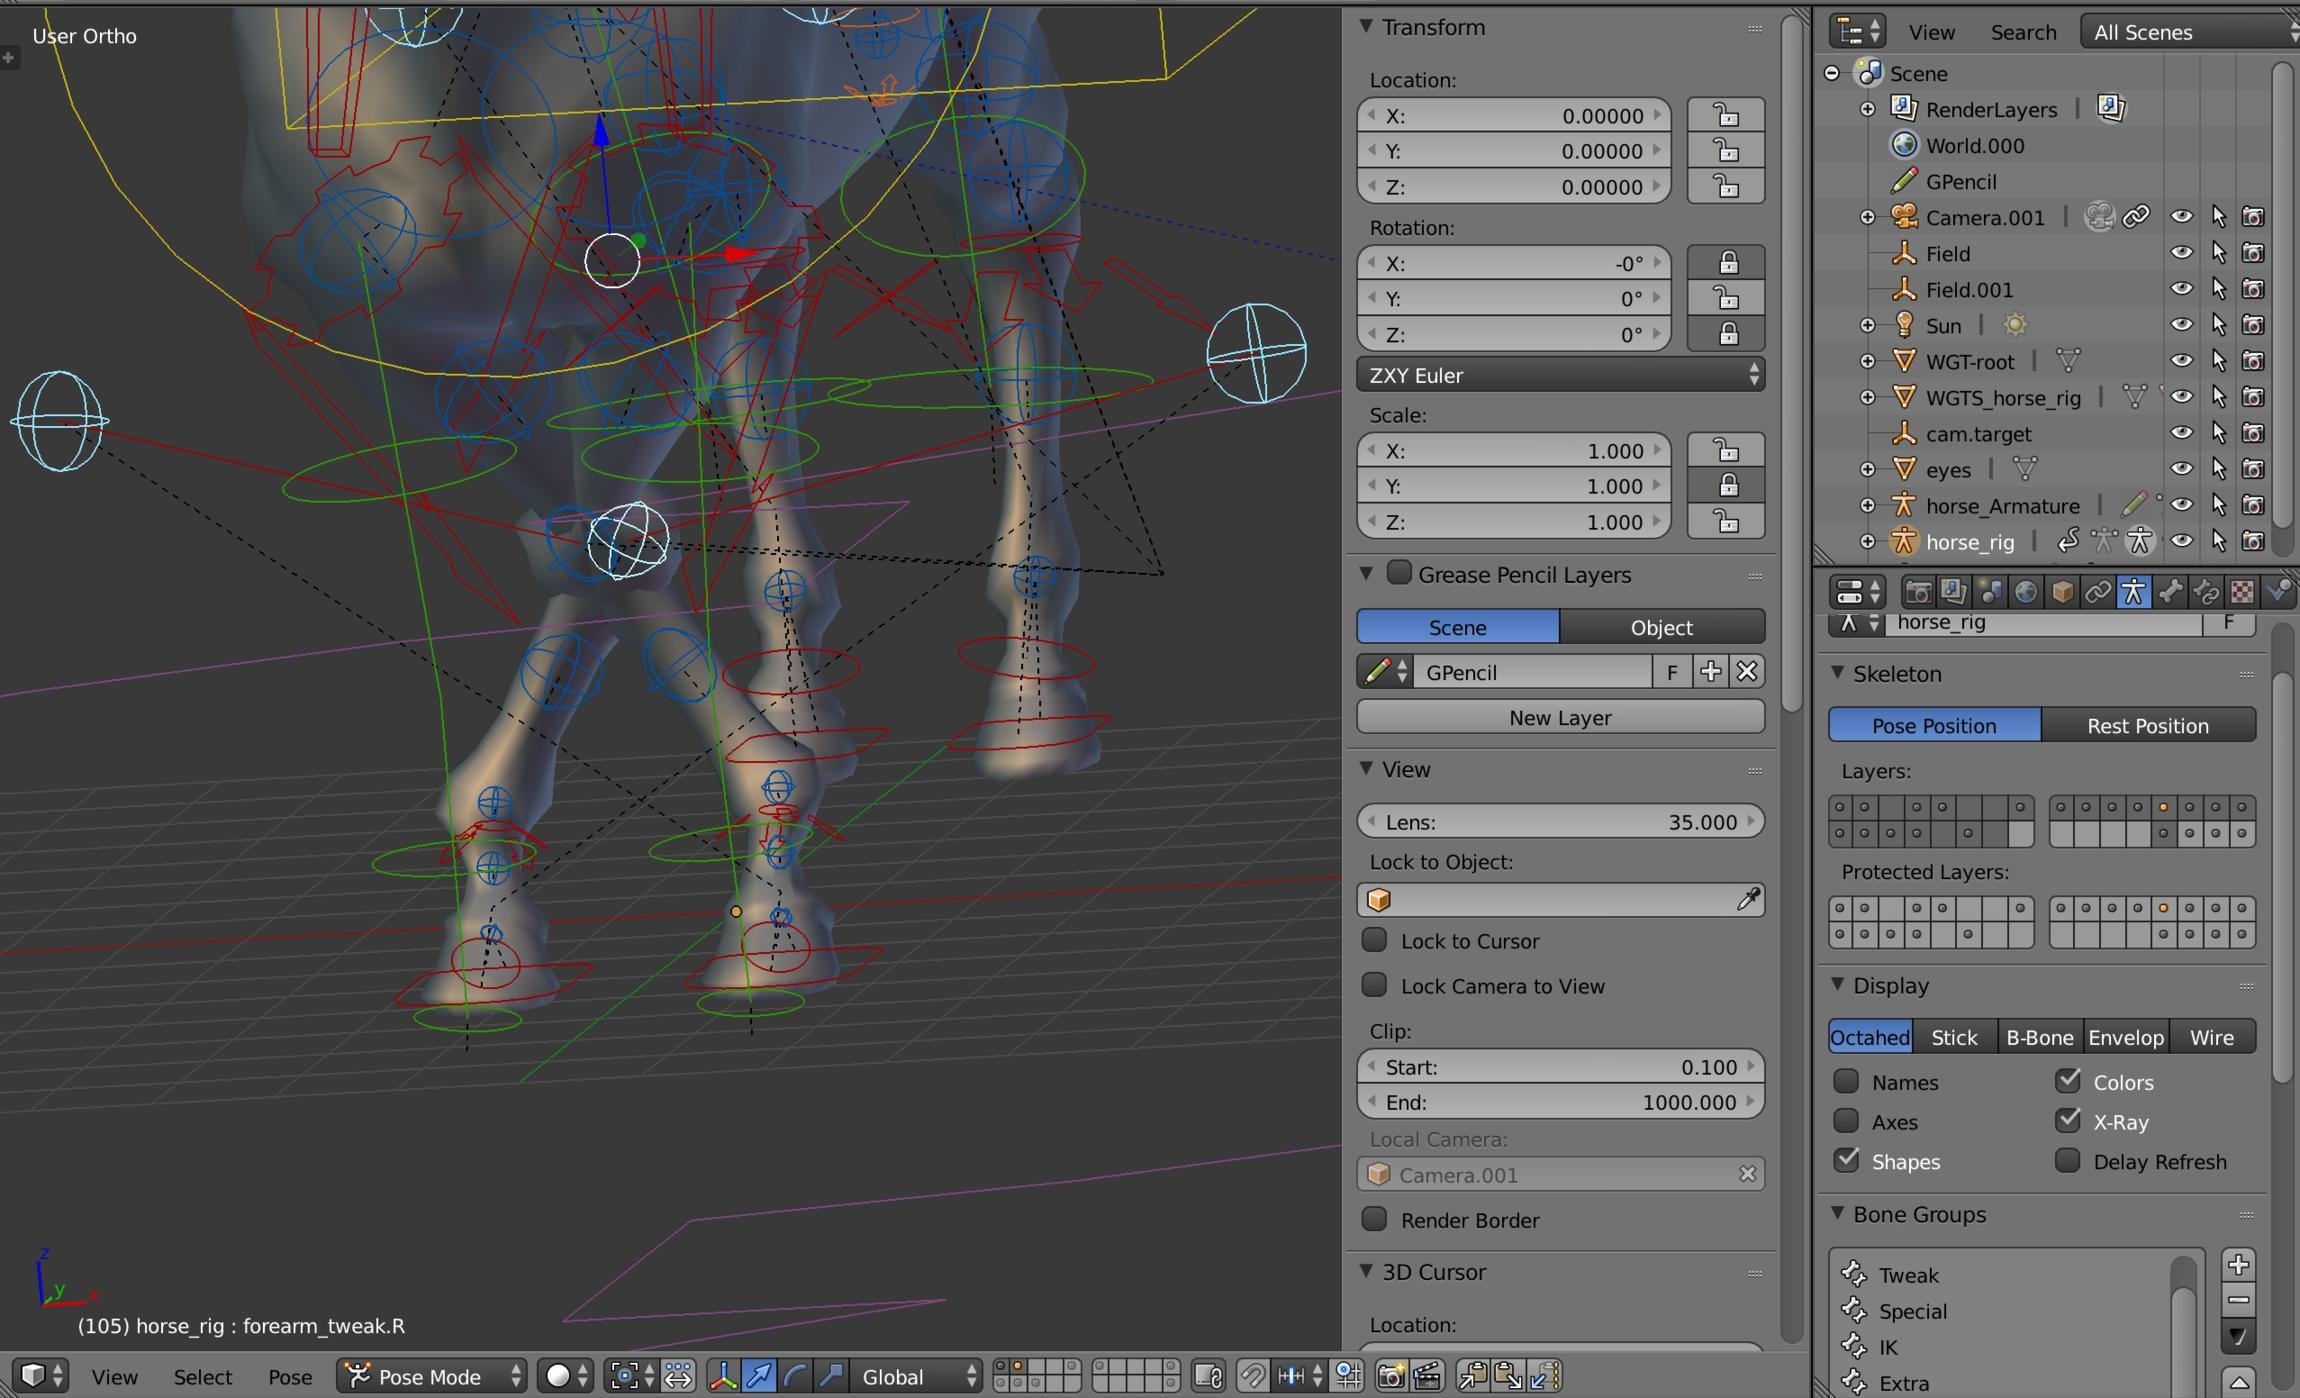 2 79 Rigify  Horse leg x-crossed bug  - Animation and